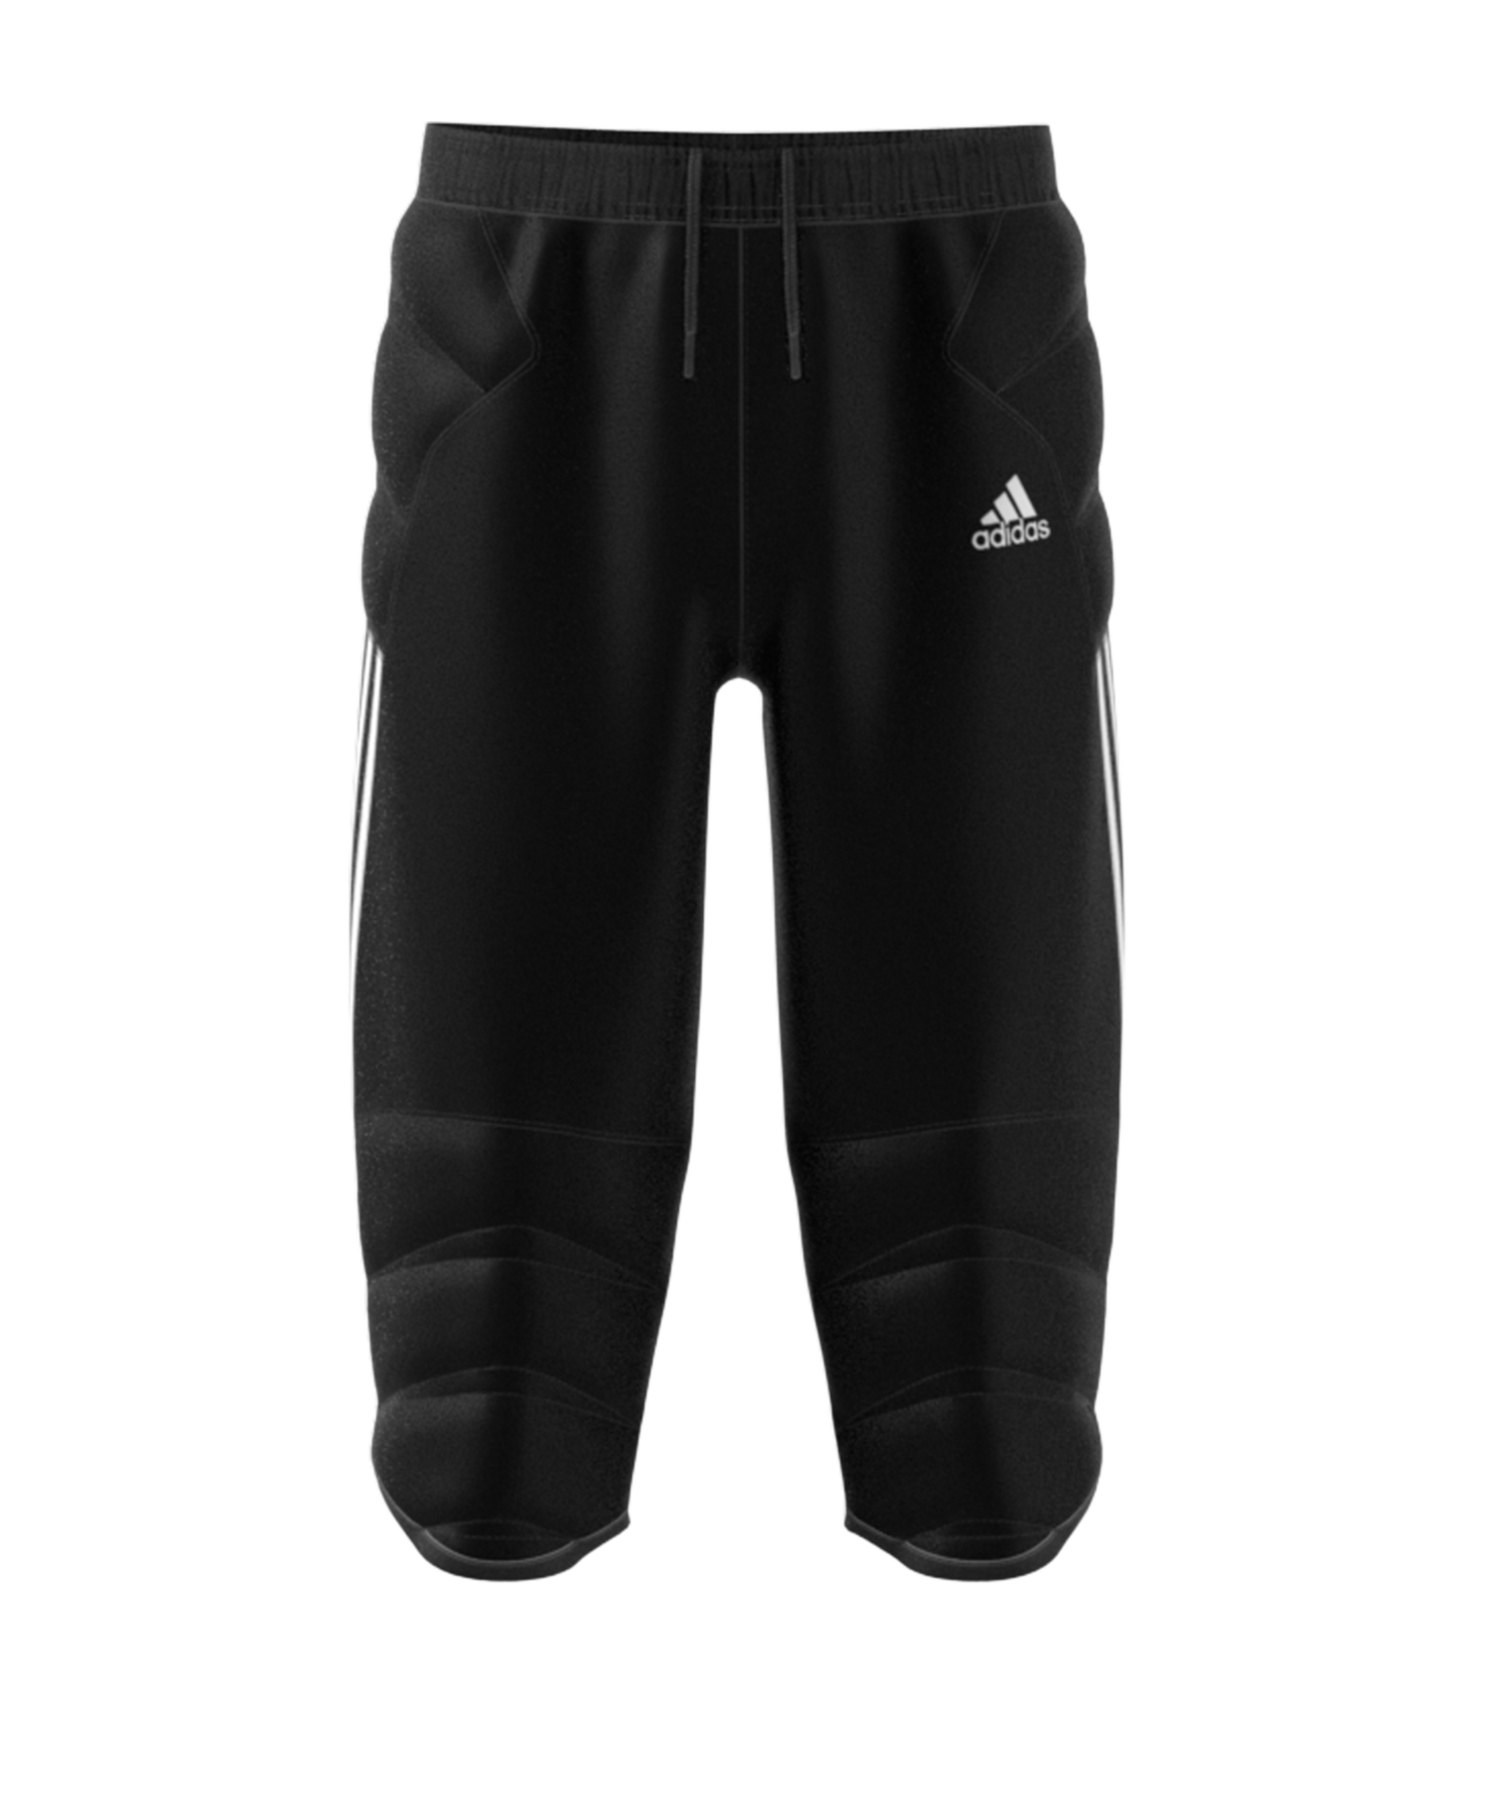 adidas Tierro 3/4 Torwarthose Kids Schwarz - schwarz